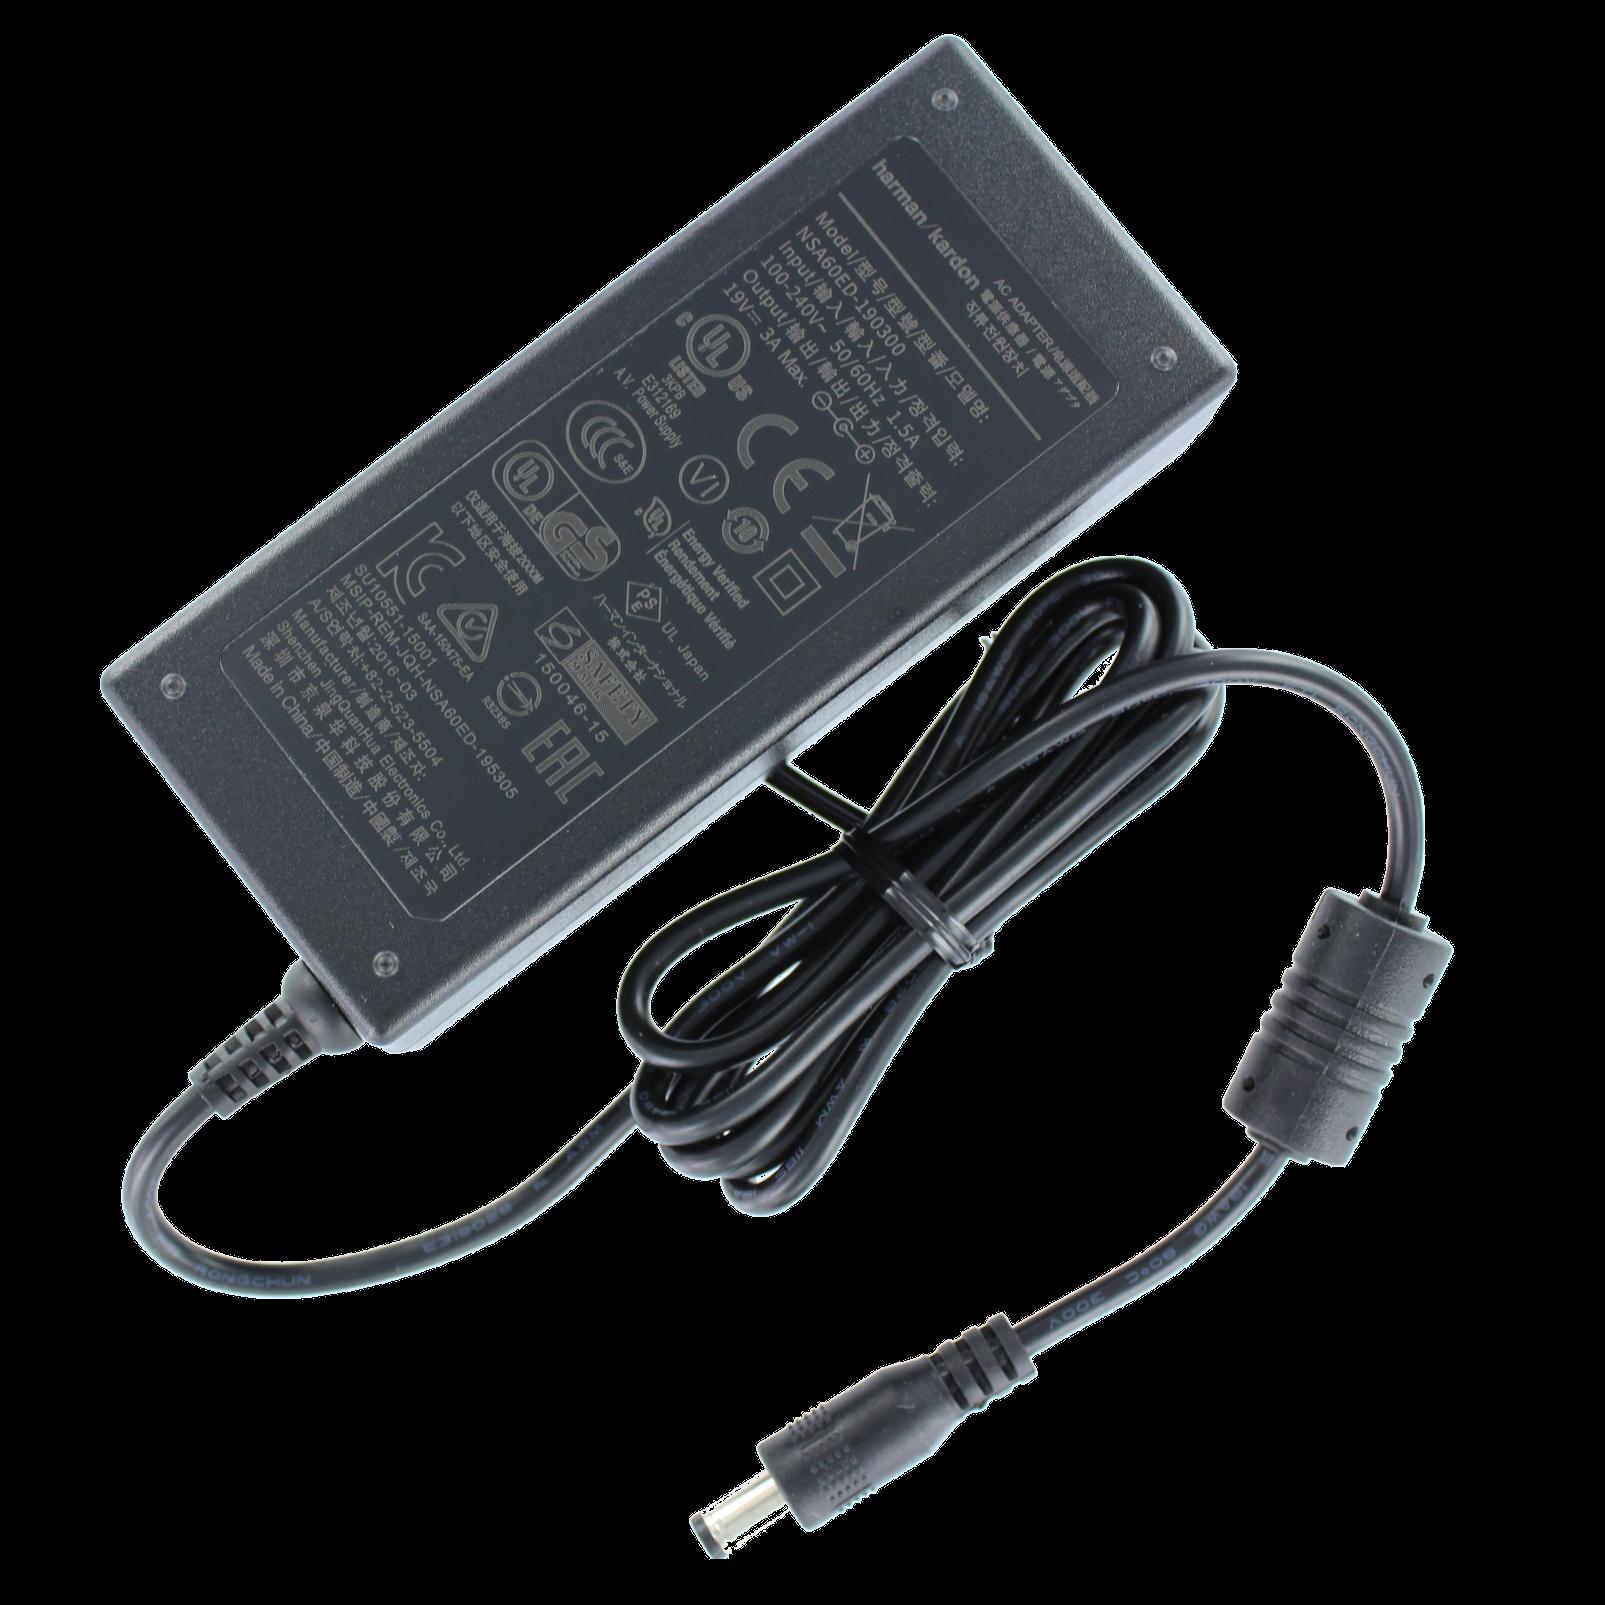 Power adapter, GoPlay mini